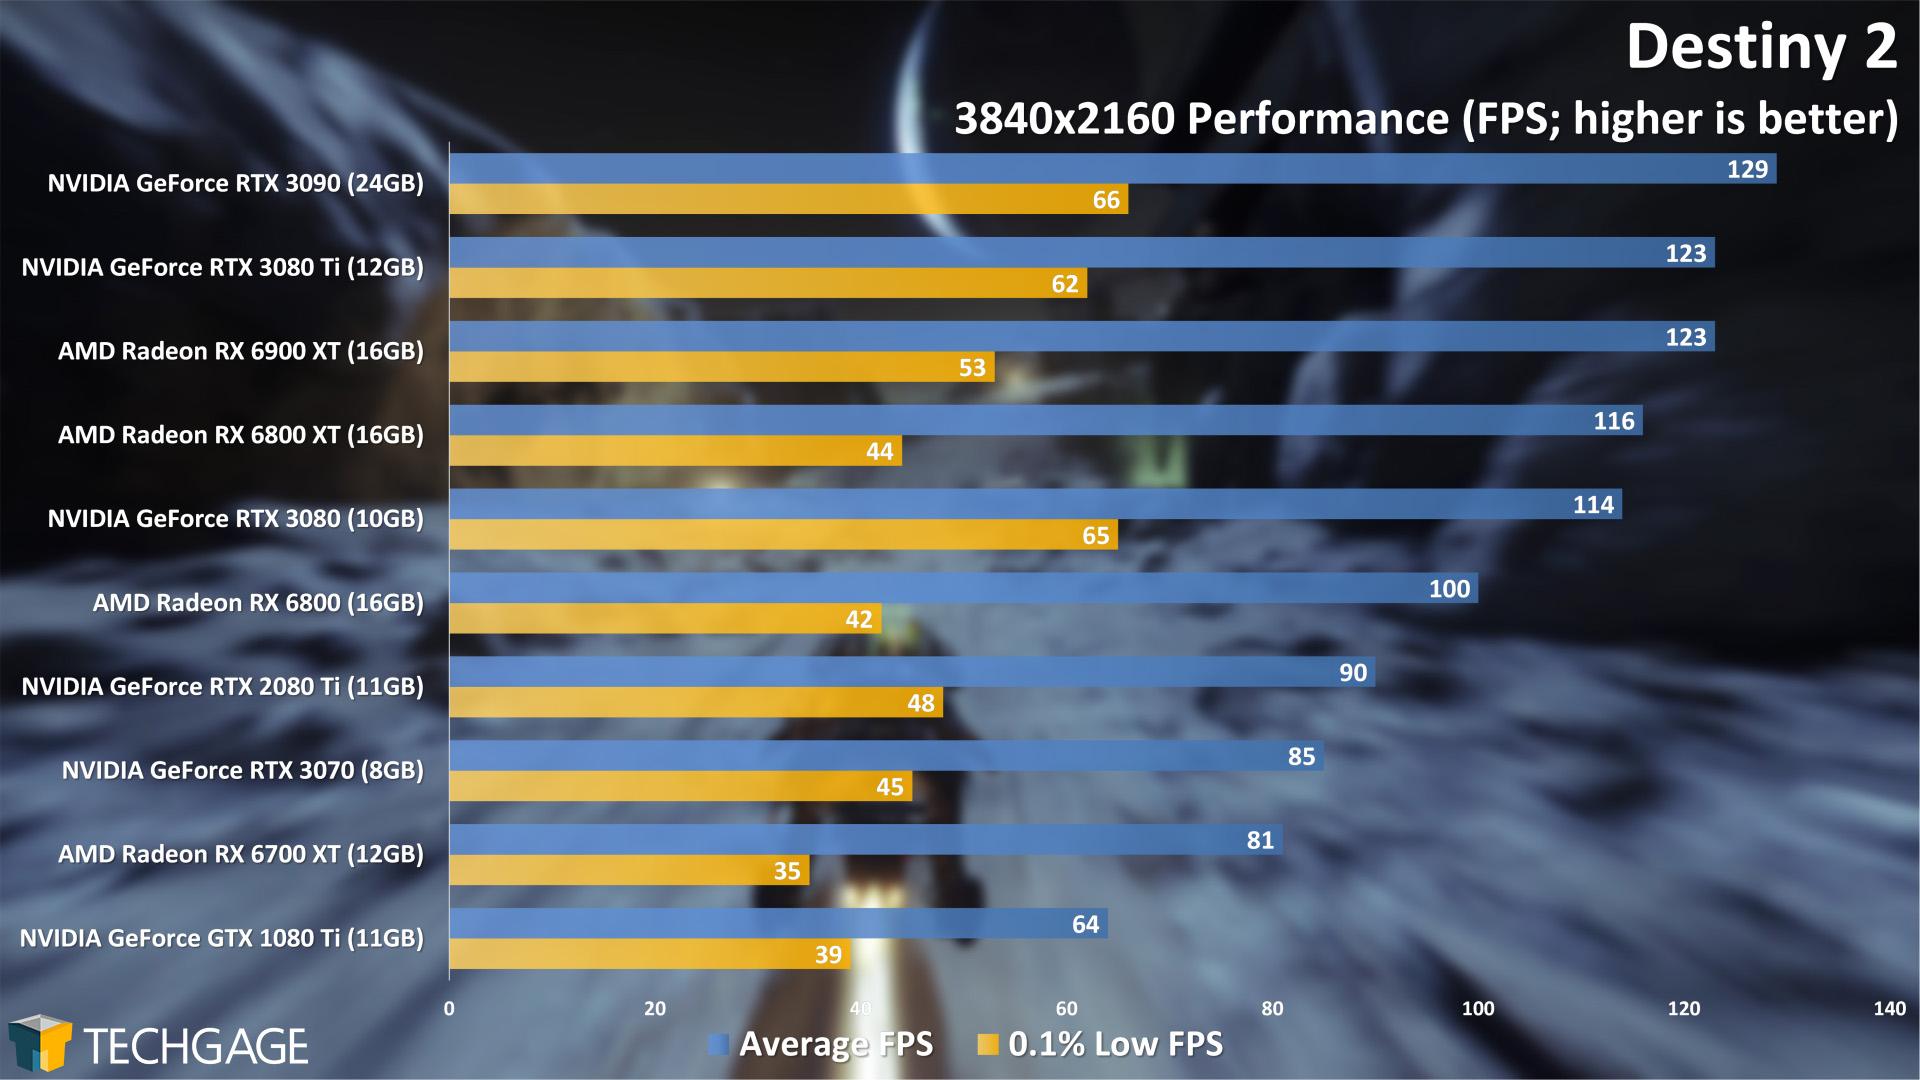 Destiny 2 - 2160p Performance (NVIDIA GeForce RTX 3080 Ti)